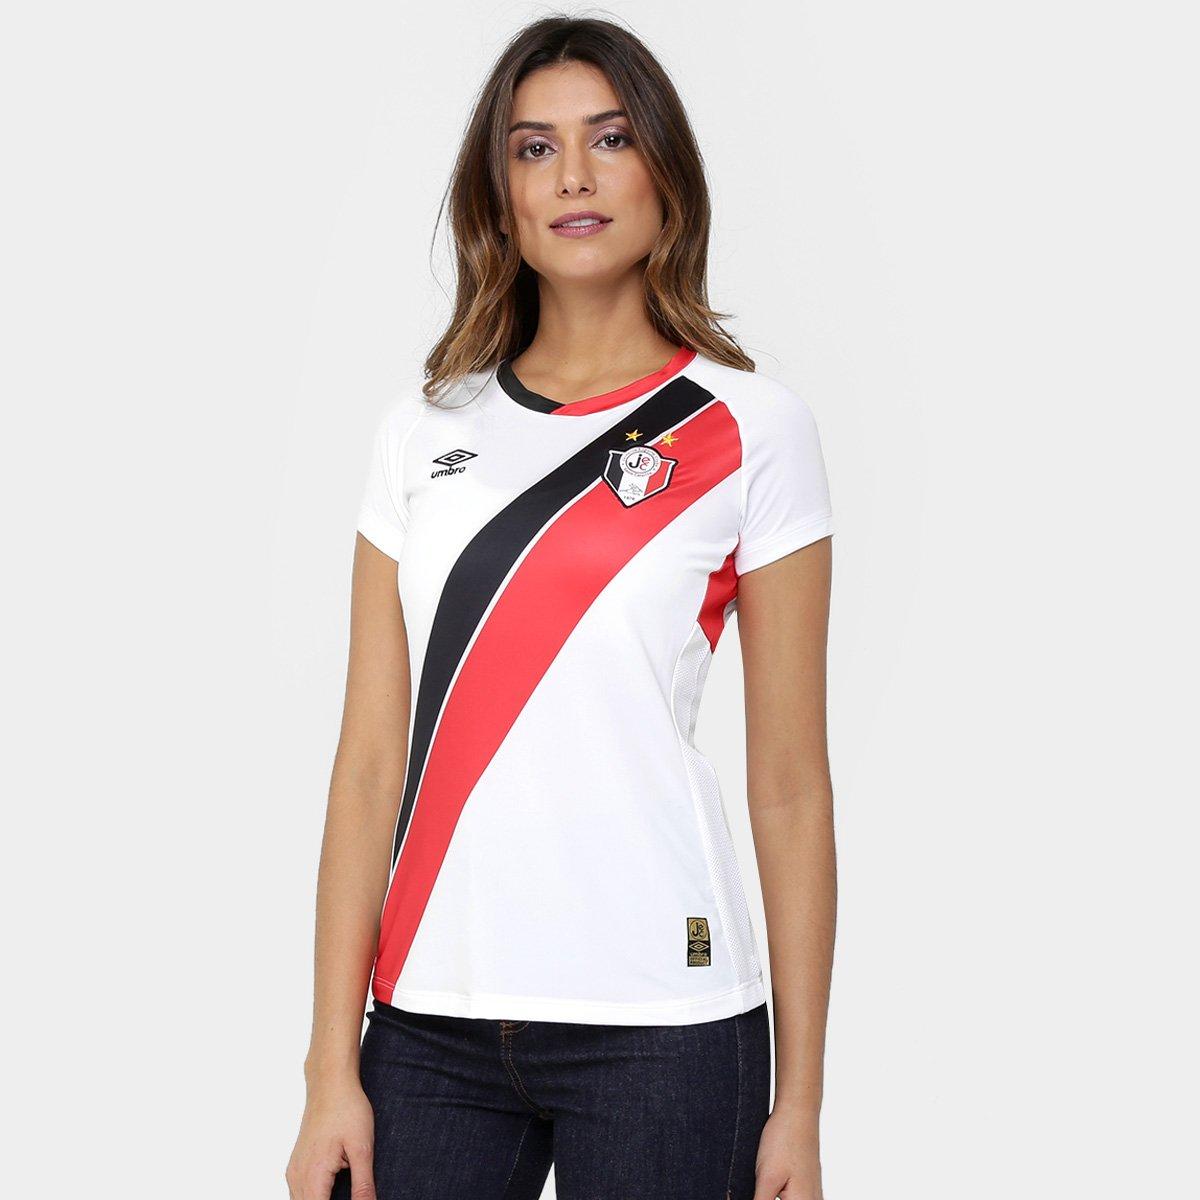 bd407a6ca86df Camisa Joinville II 2015 s nº Torcedor Umbro Feminina